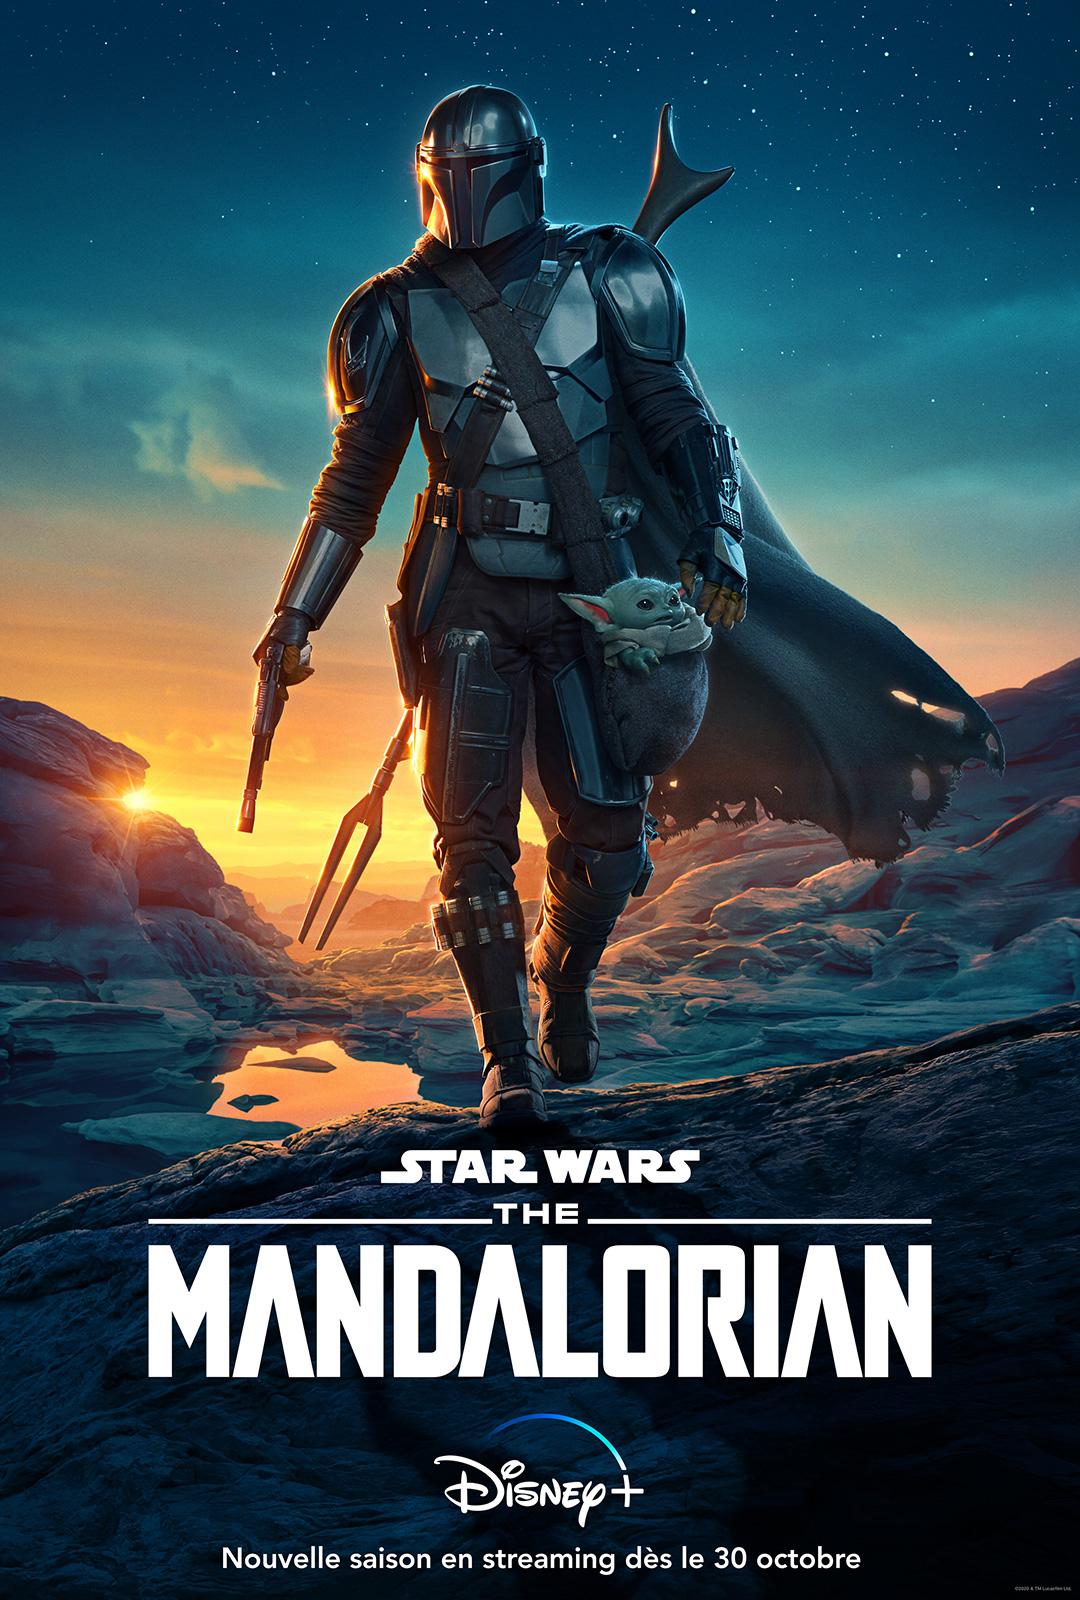 Star Wars 8 Diffusion Tv : diffusion, Mandalorian, Série, AlloCiné